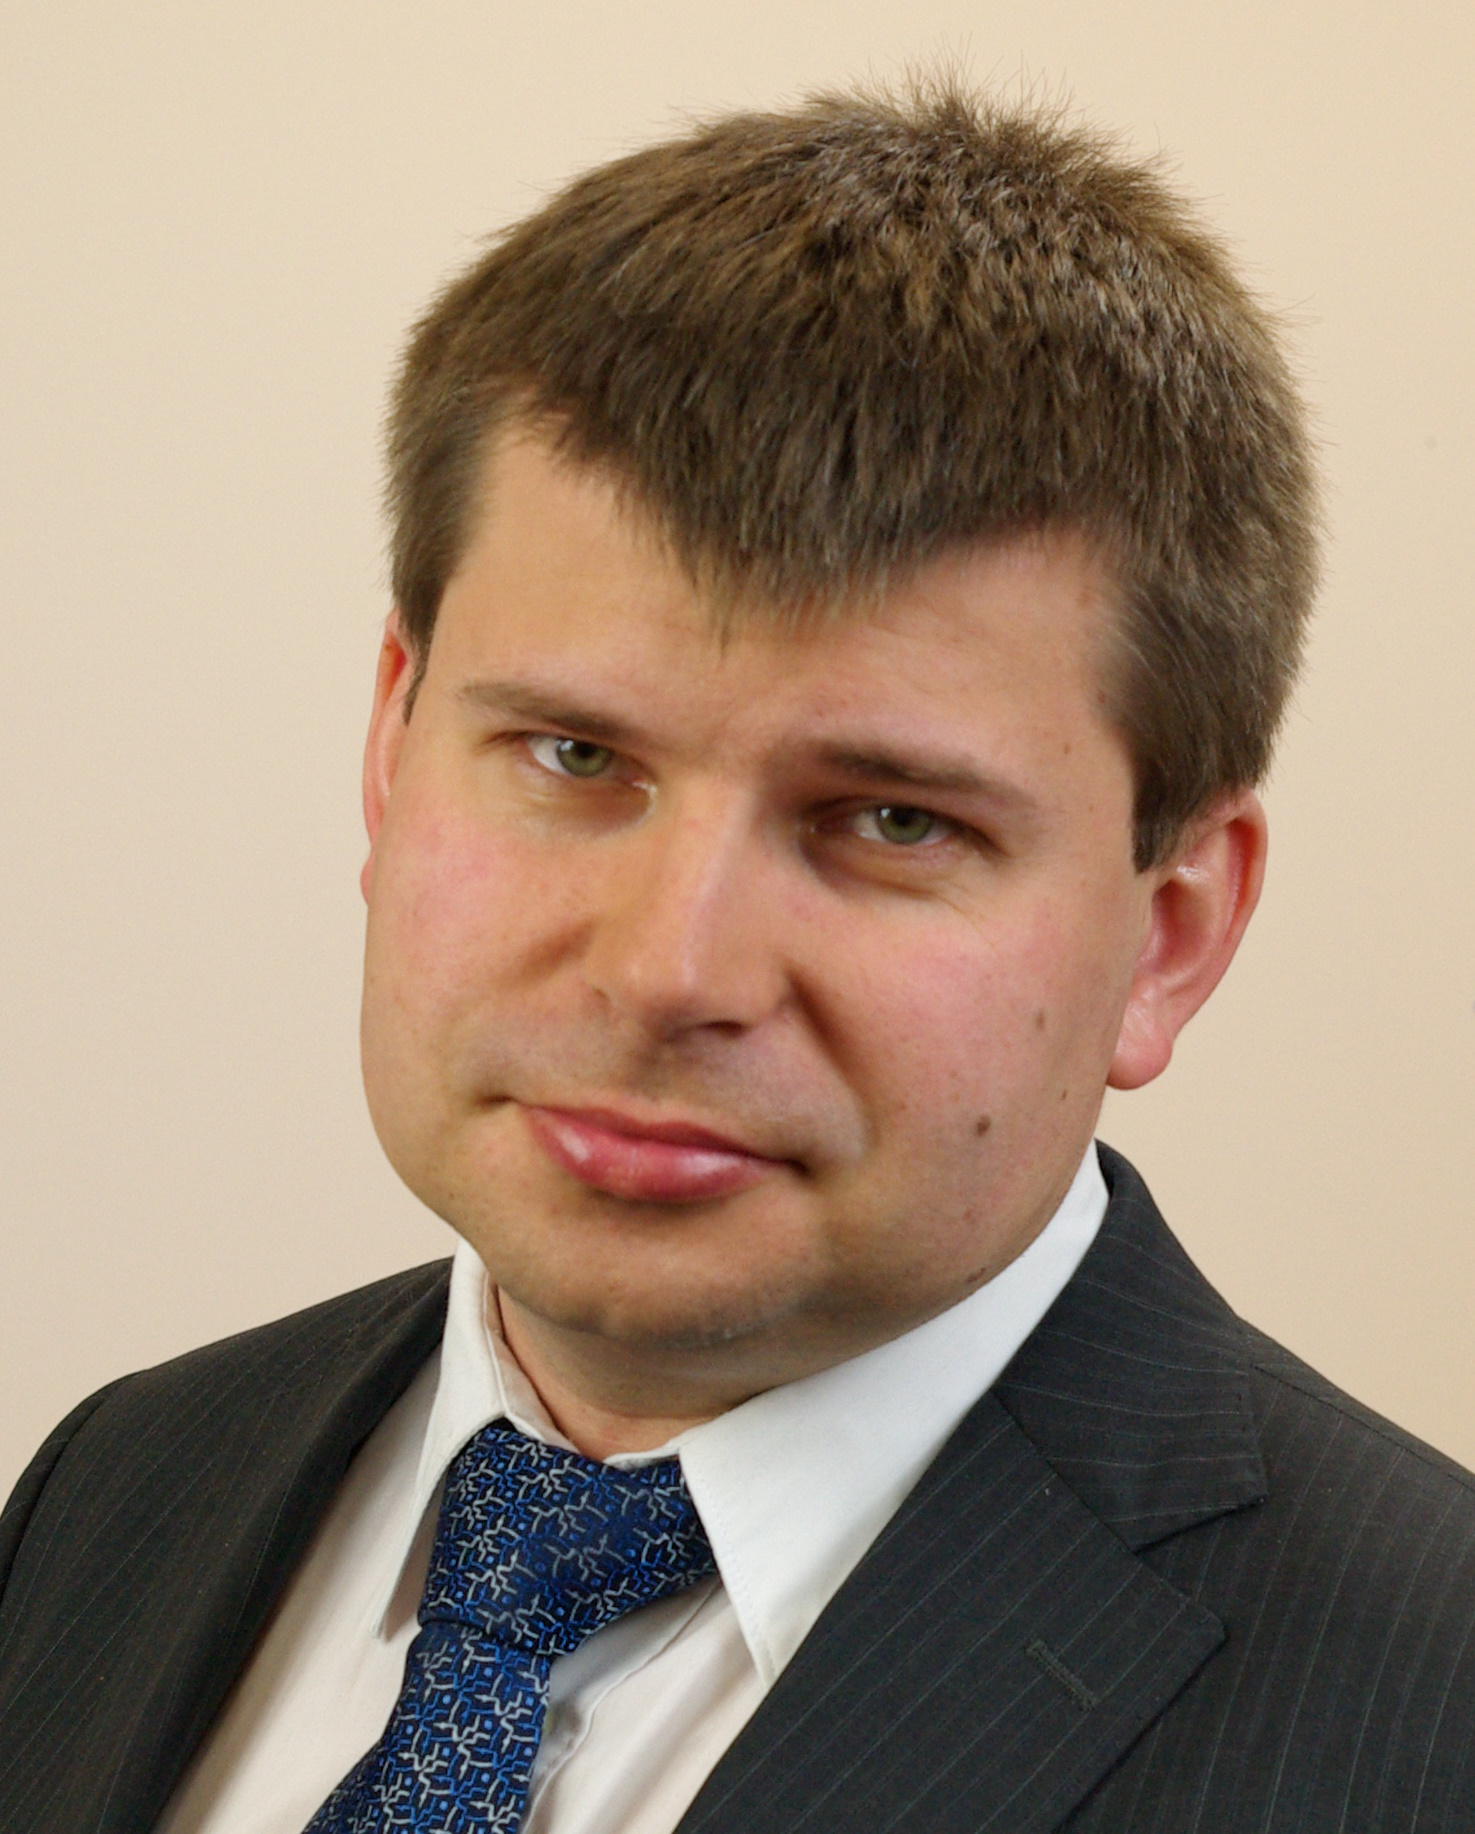 Tomasz Chomicki